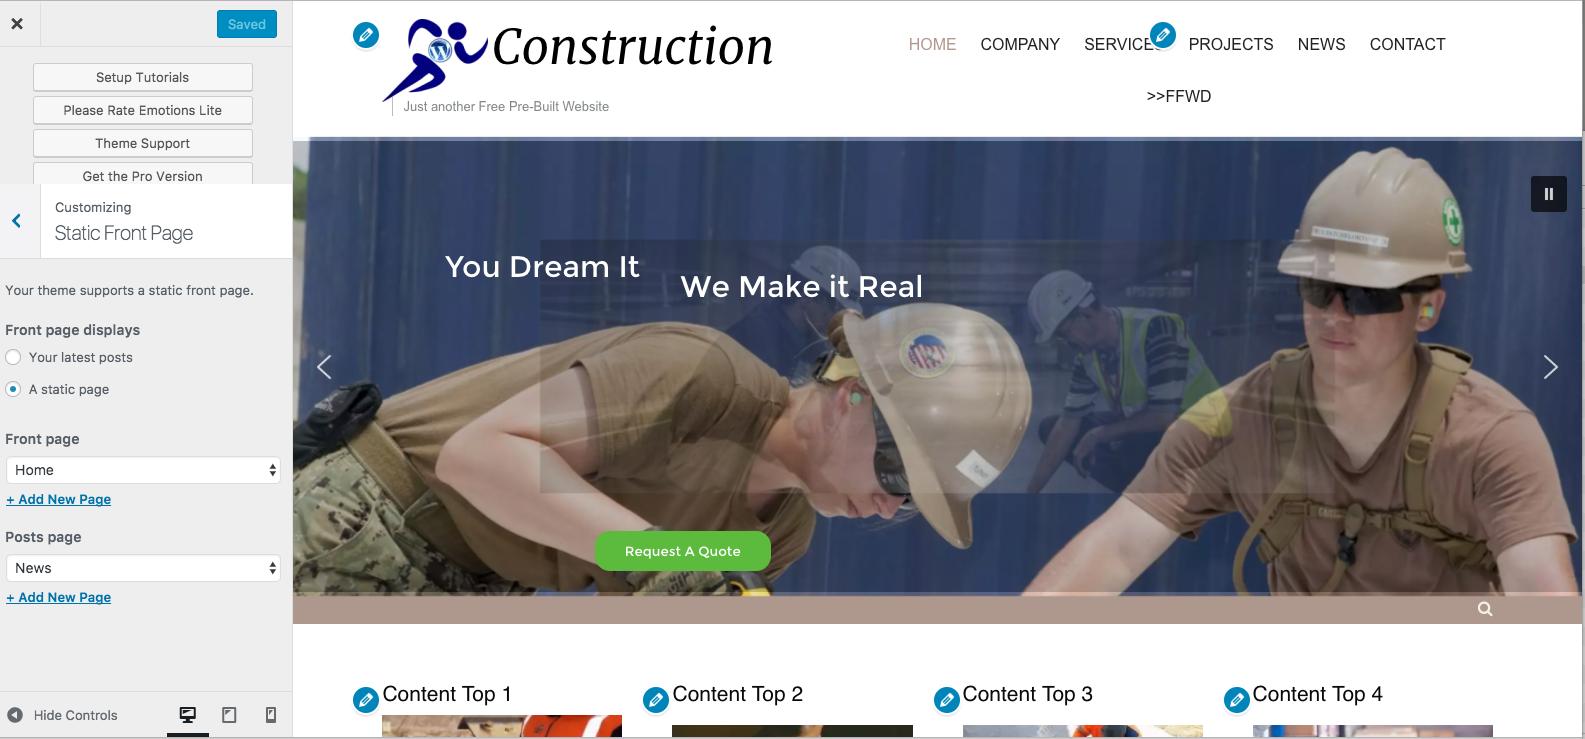 Construction Pre-built Wordpress Website